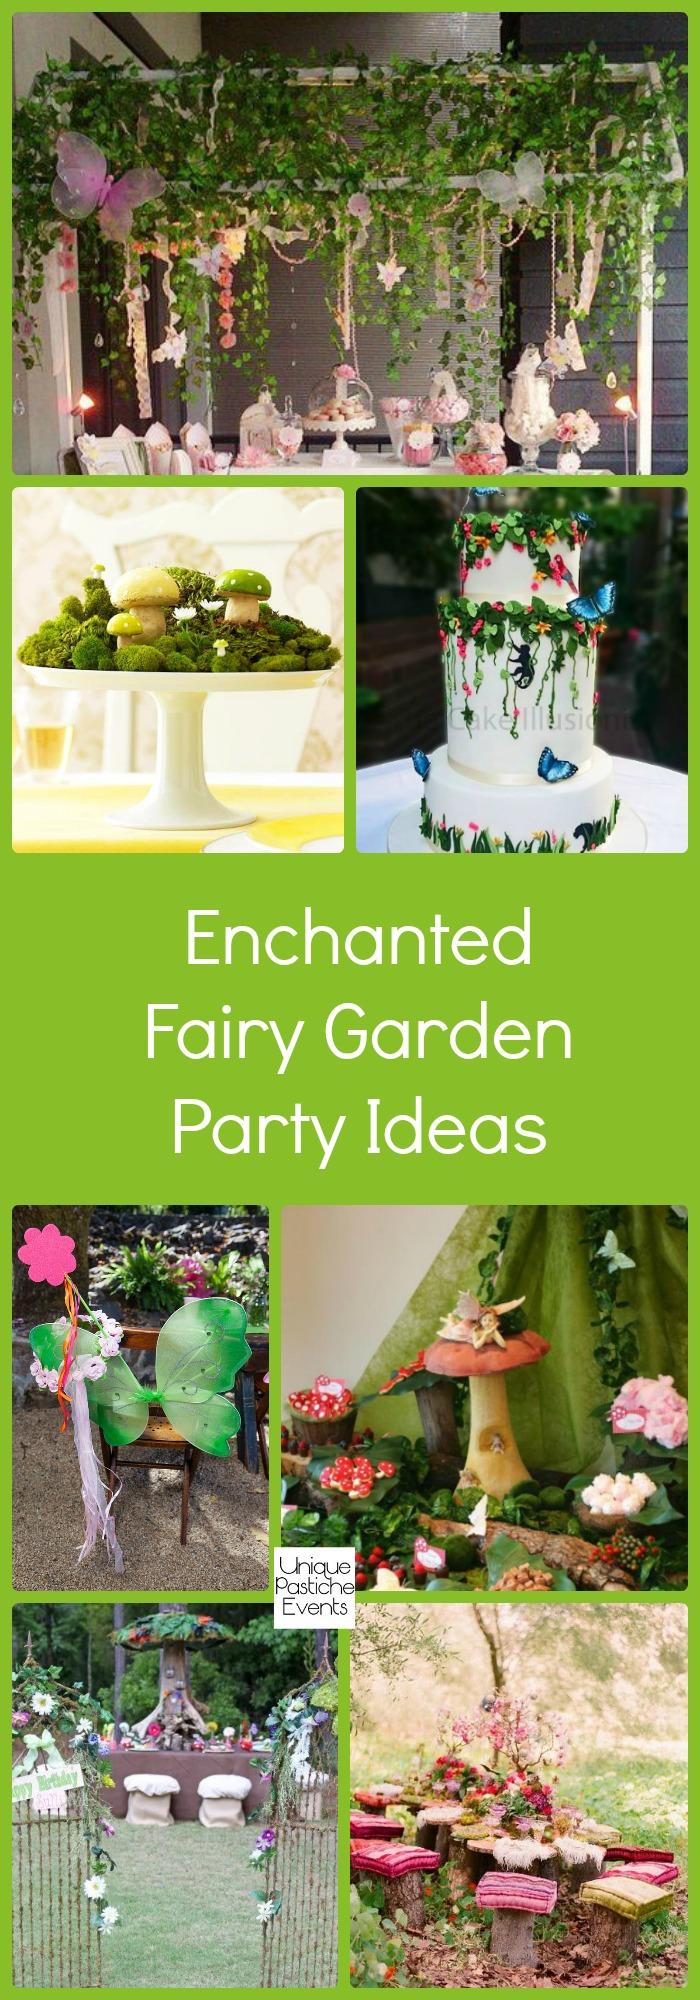 Enchanted Garden: Children's Party Inspiration